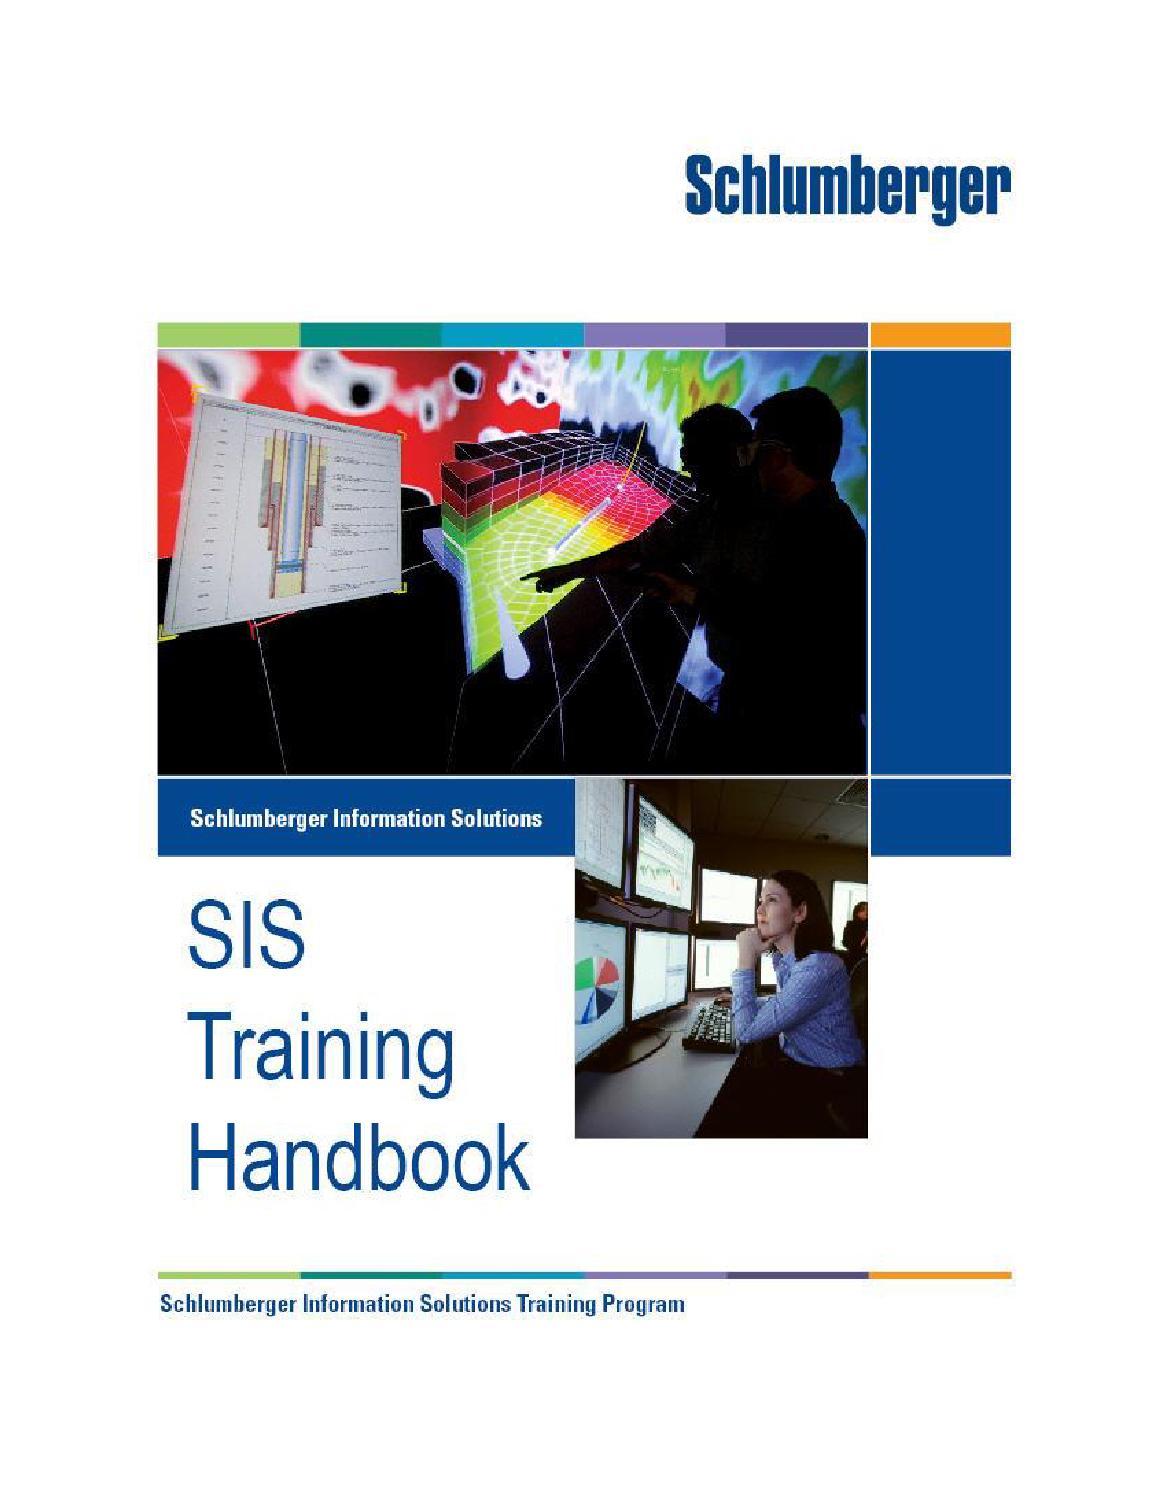 SIS Training Handbook by Schlumberger - issuu